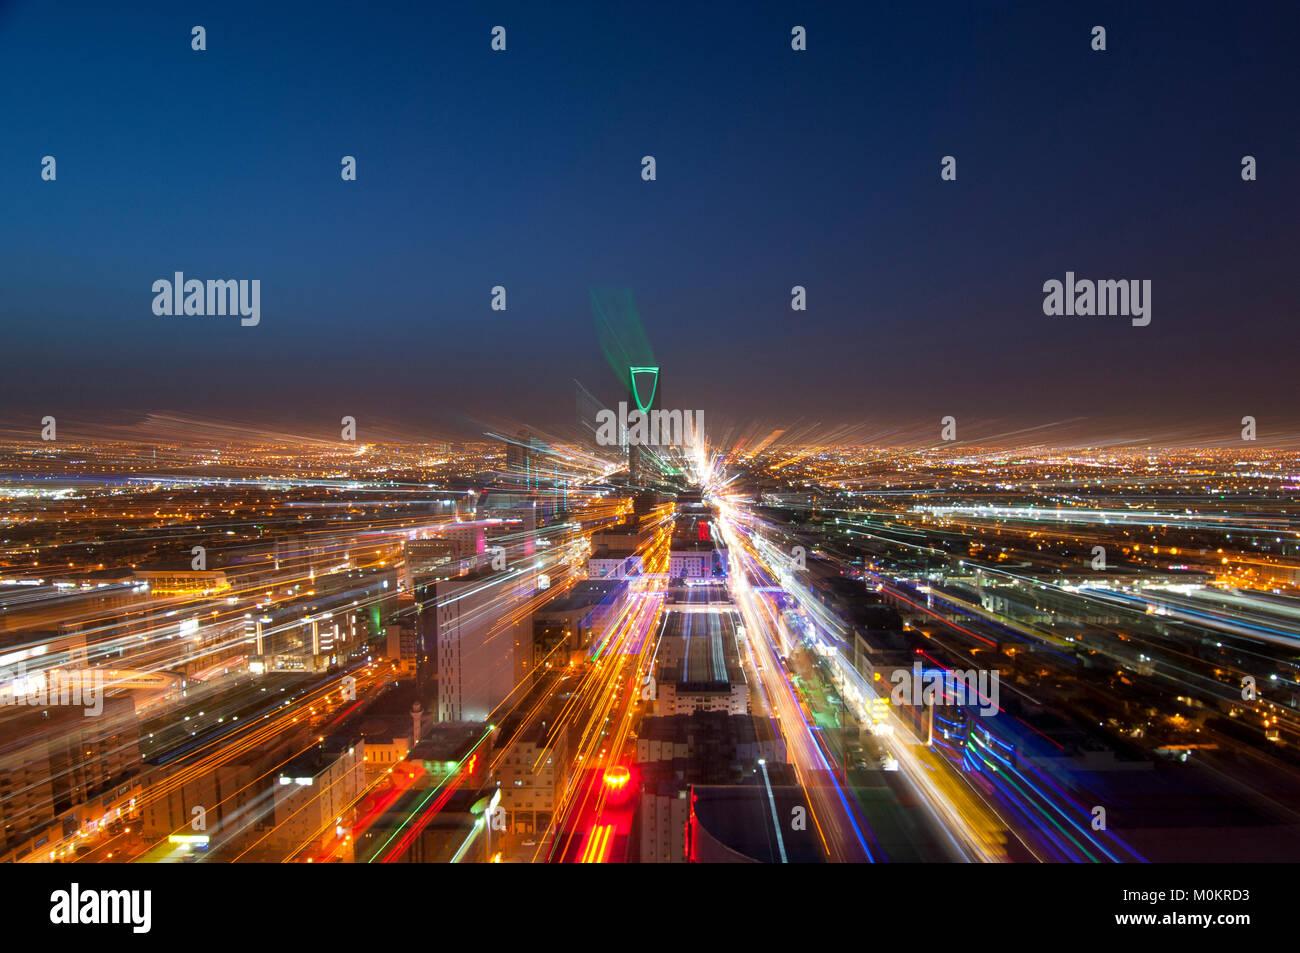 Riyadh skyline notturno n. 4 Immagini Stock